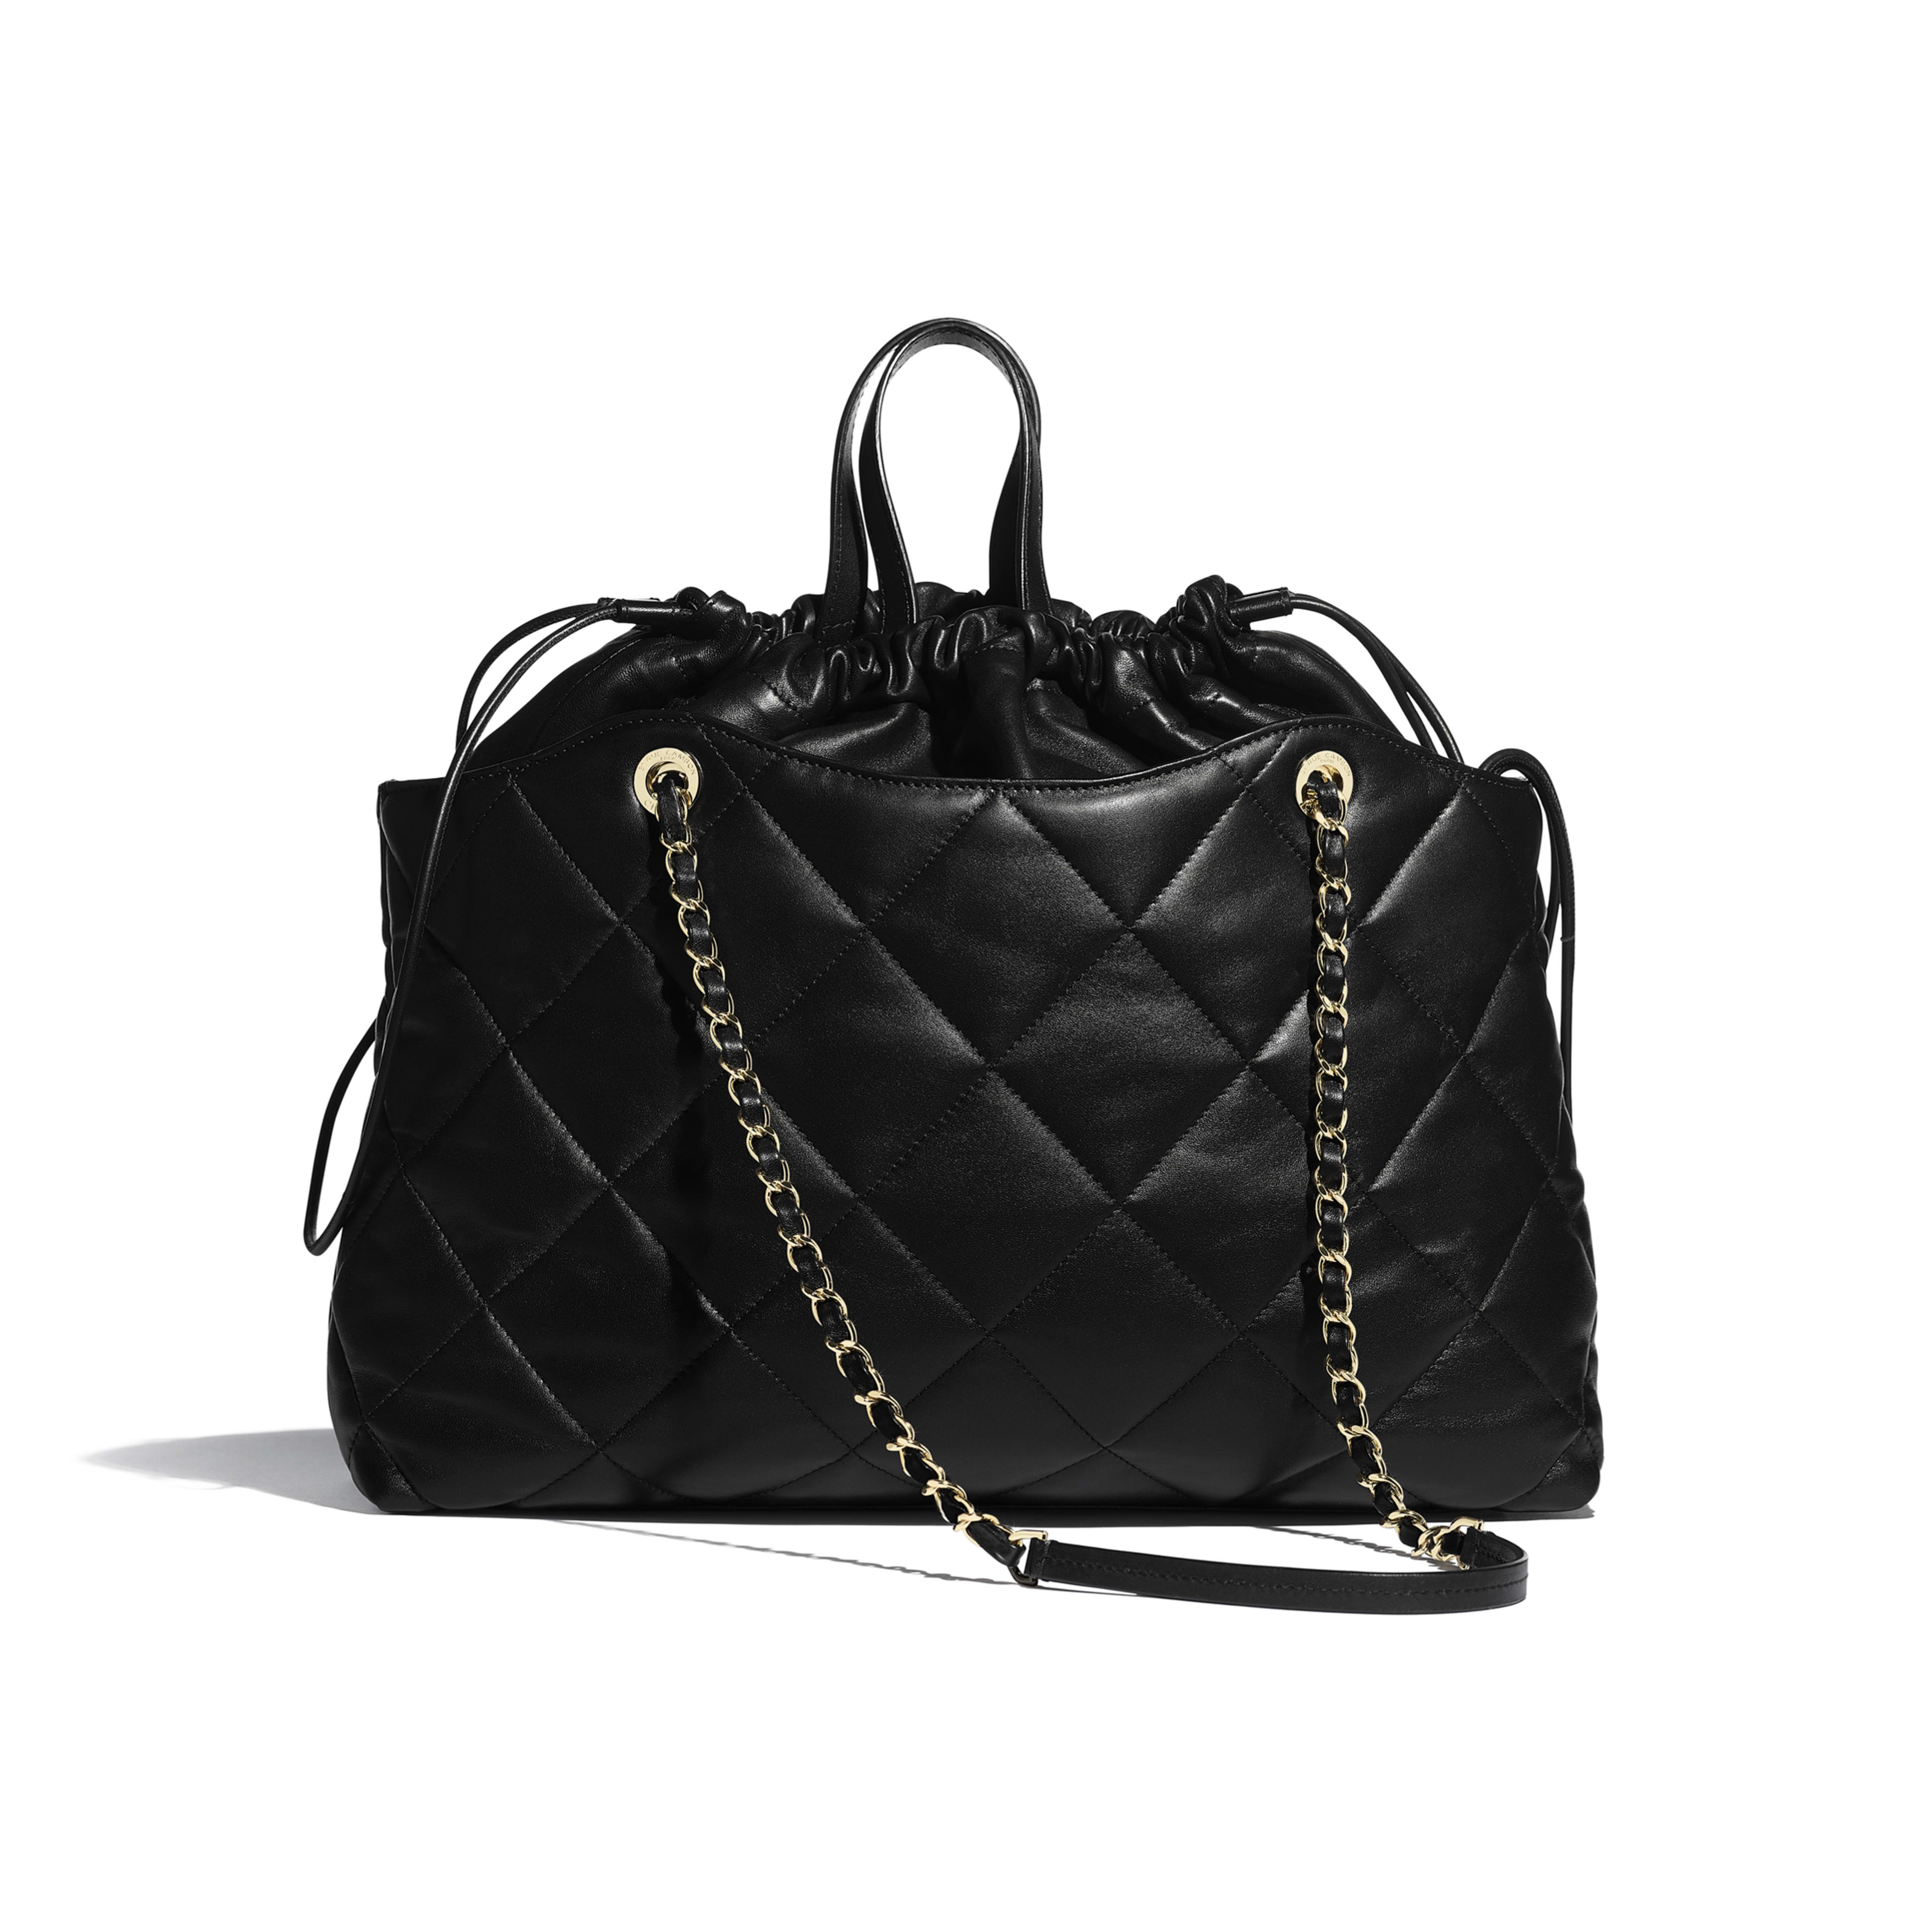 Shopping Bag - Black - Lambskin - Alternative view - see full sized version